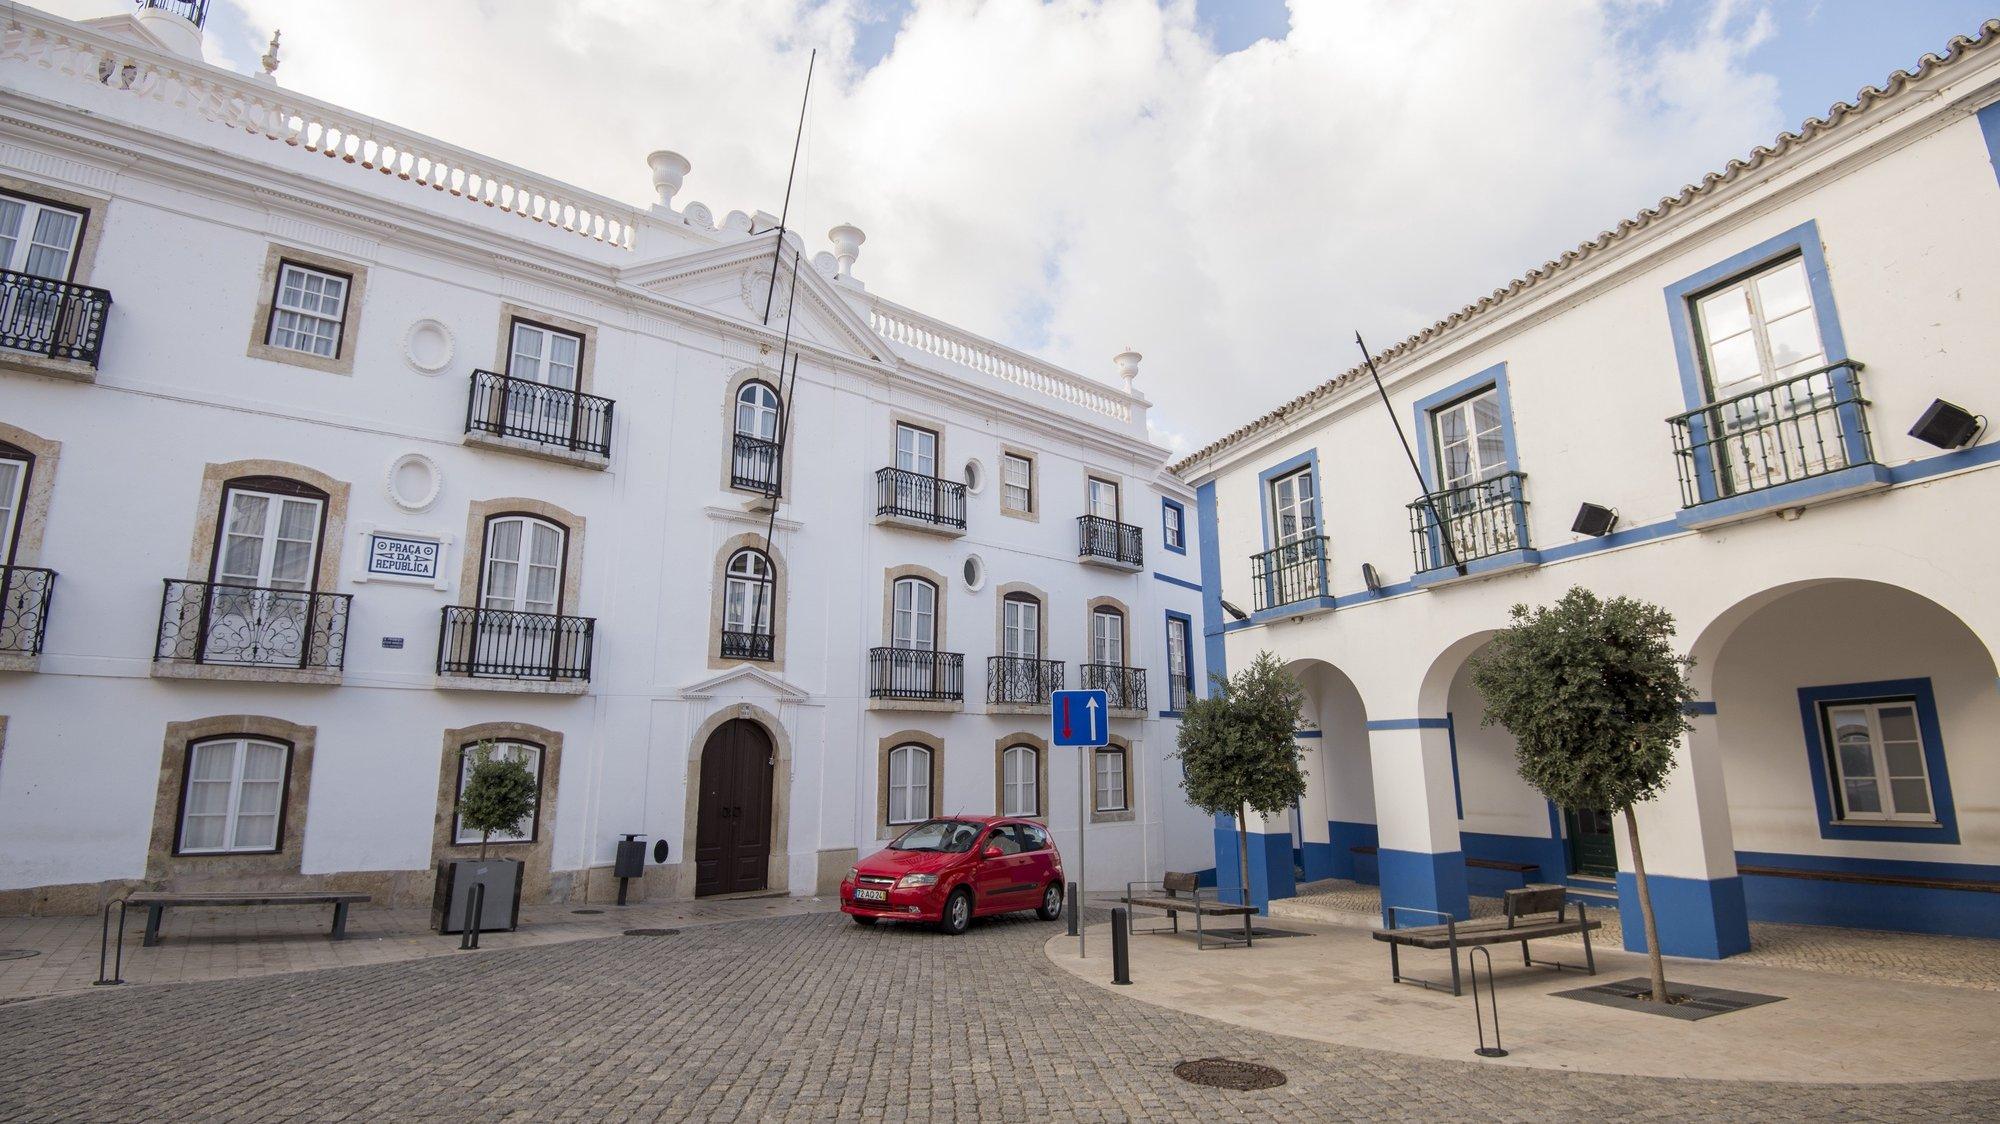 Edifício da Câmara Municipal de Odemira, Odemira, 4 de novembro de 2017. TIAGO CANHOTO/LUSA